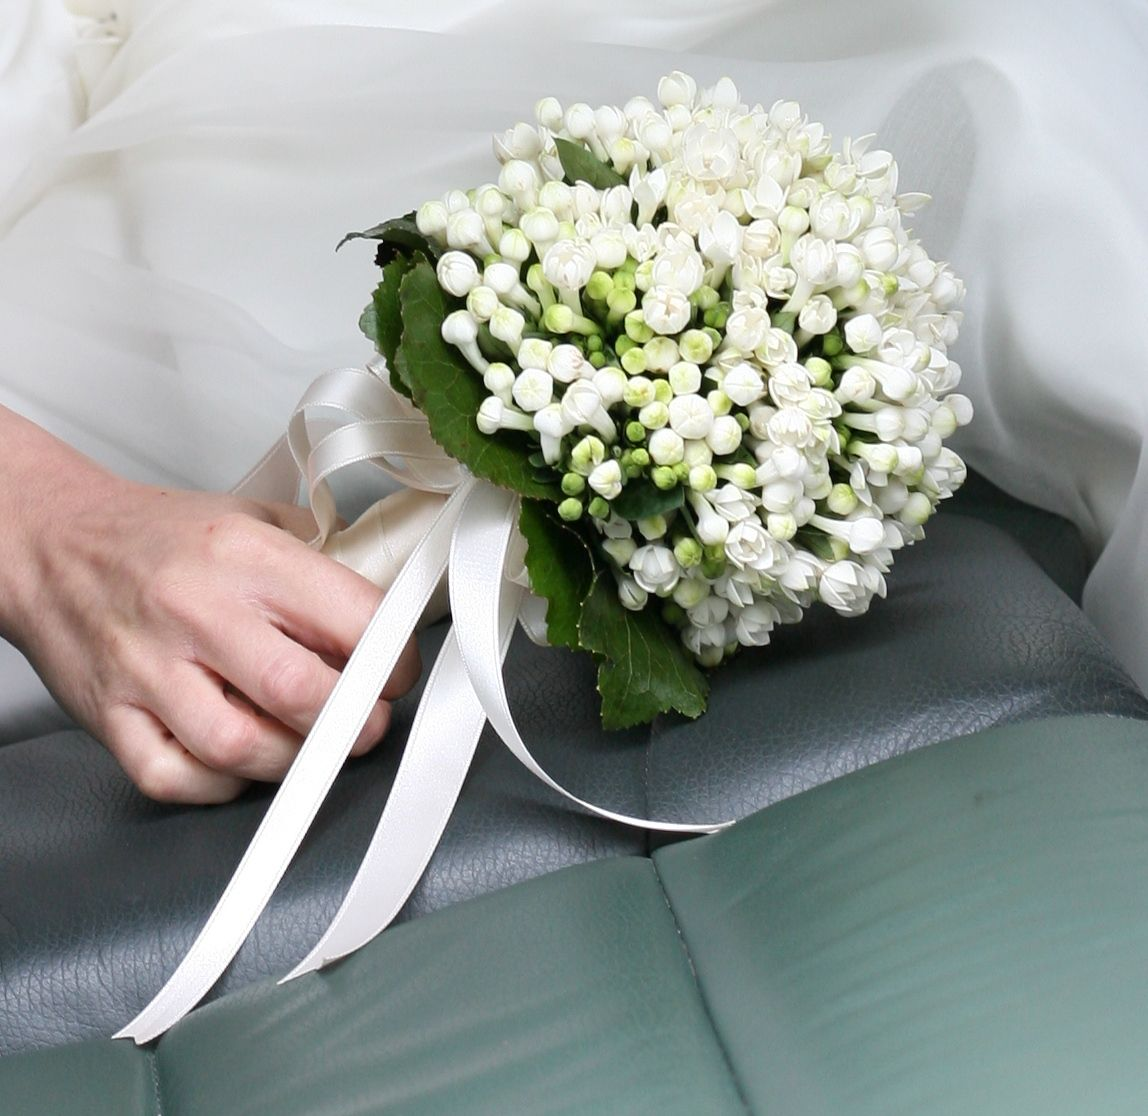 Elegant Wedding Bouquet All Made Of White Bouvardia Flowers Bouquet Matrimonio Matrimonio Floreale Fiori Per Matrimoni